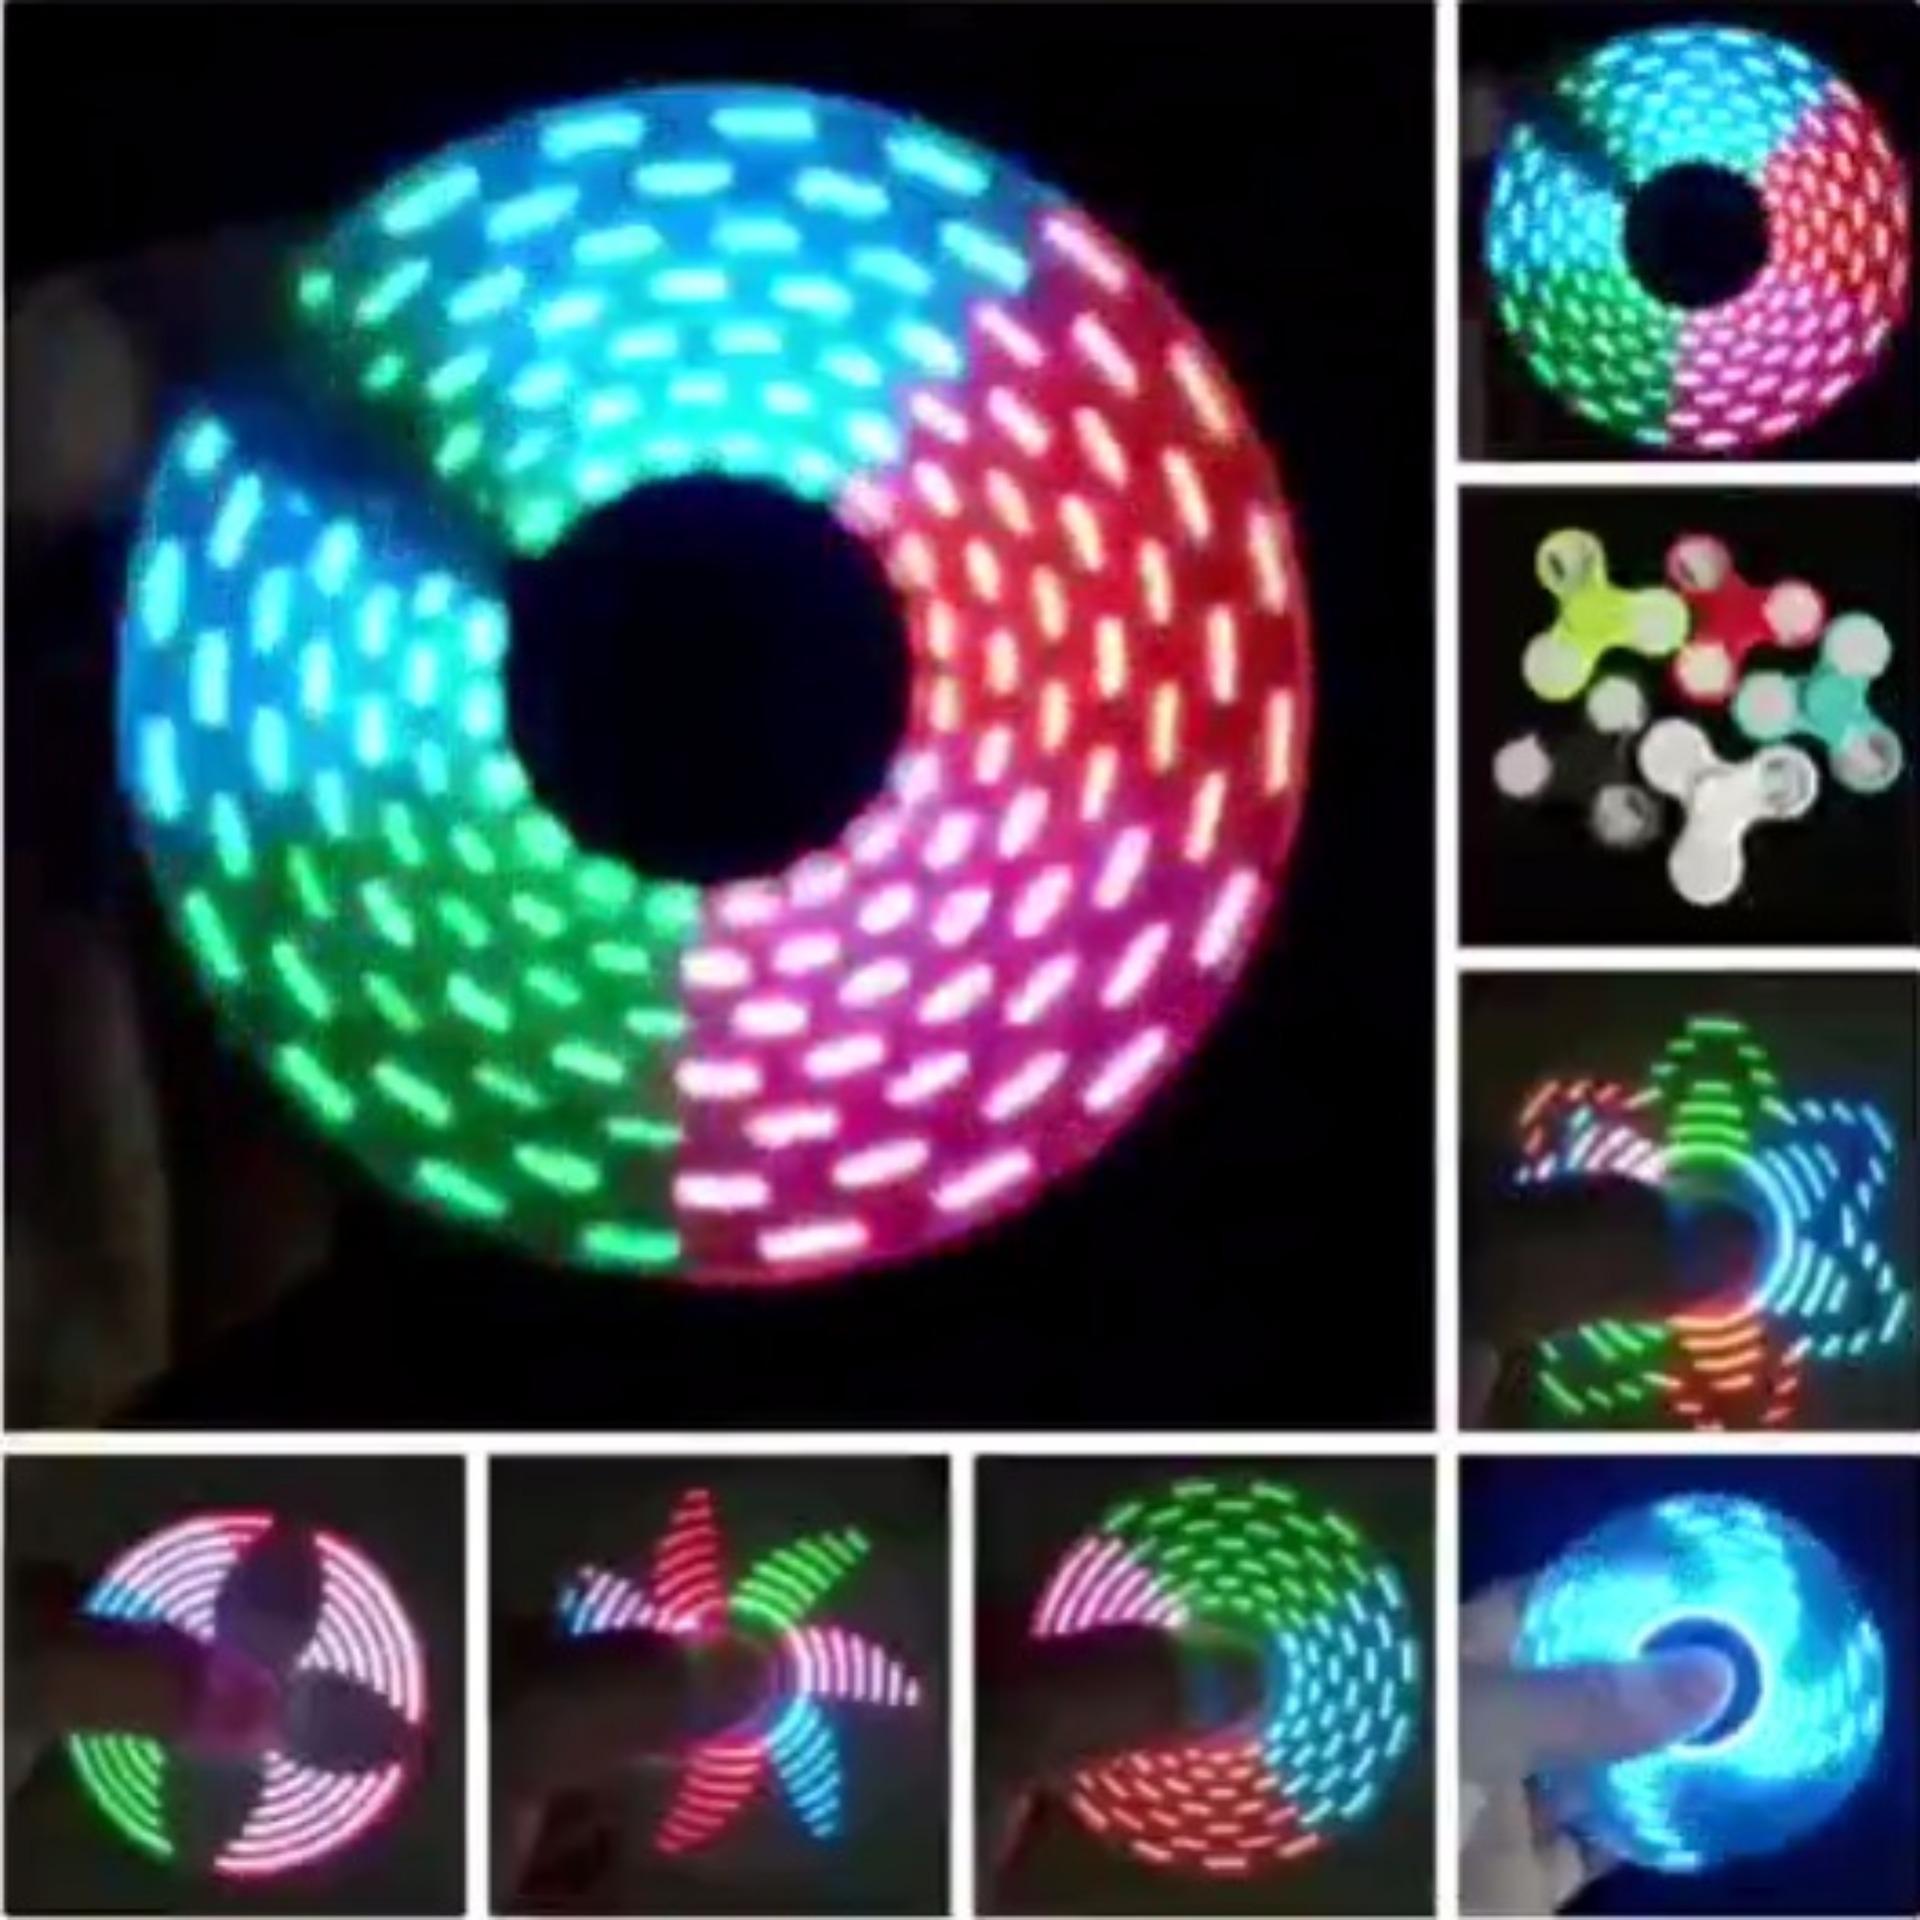 Lucky LED Glow Nyala Gambar Warna Warni Fidget Spinner Hand Spinner Toys Focus Games Mainan Spiner